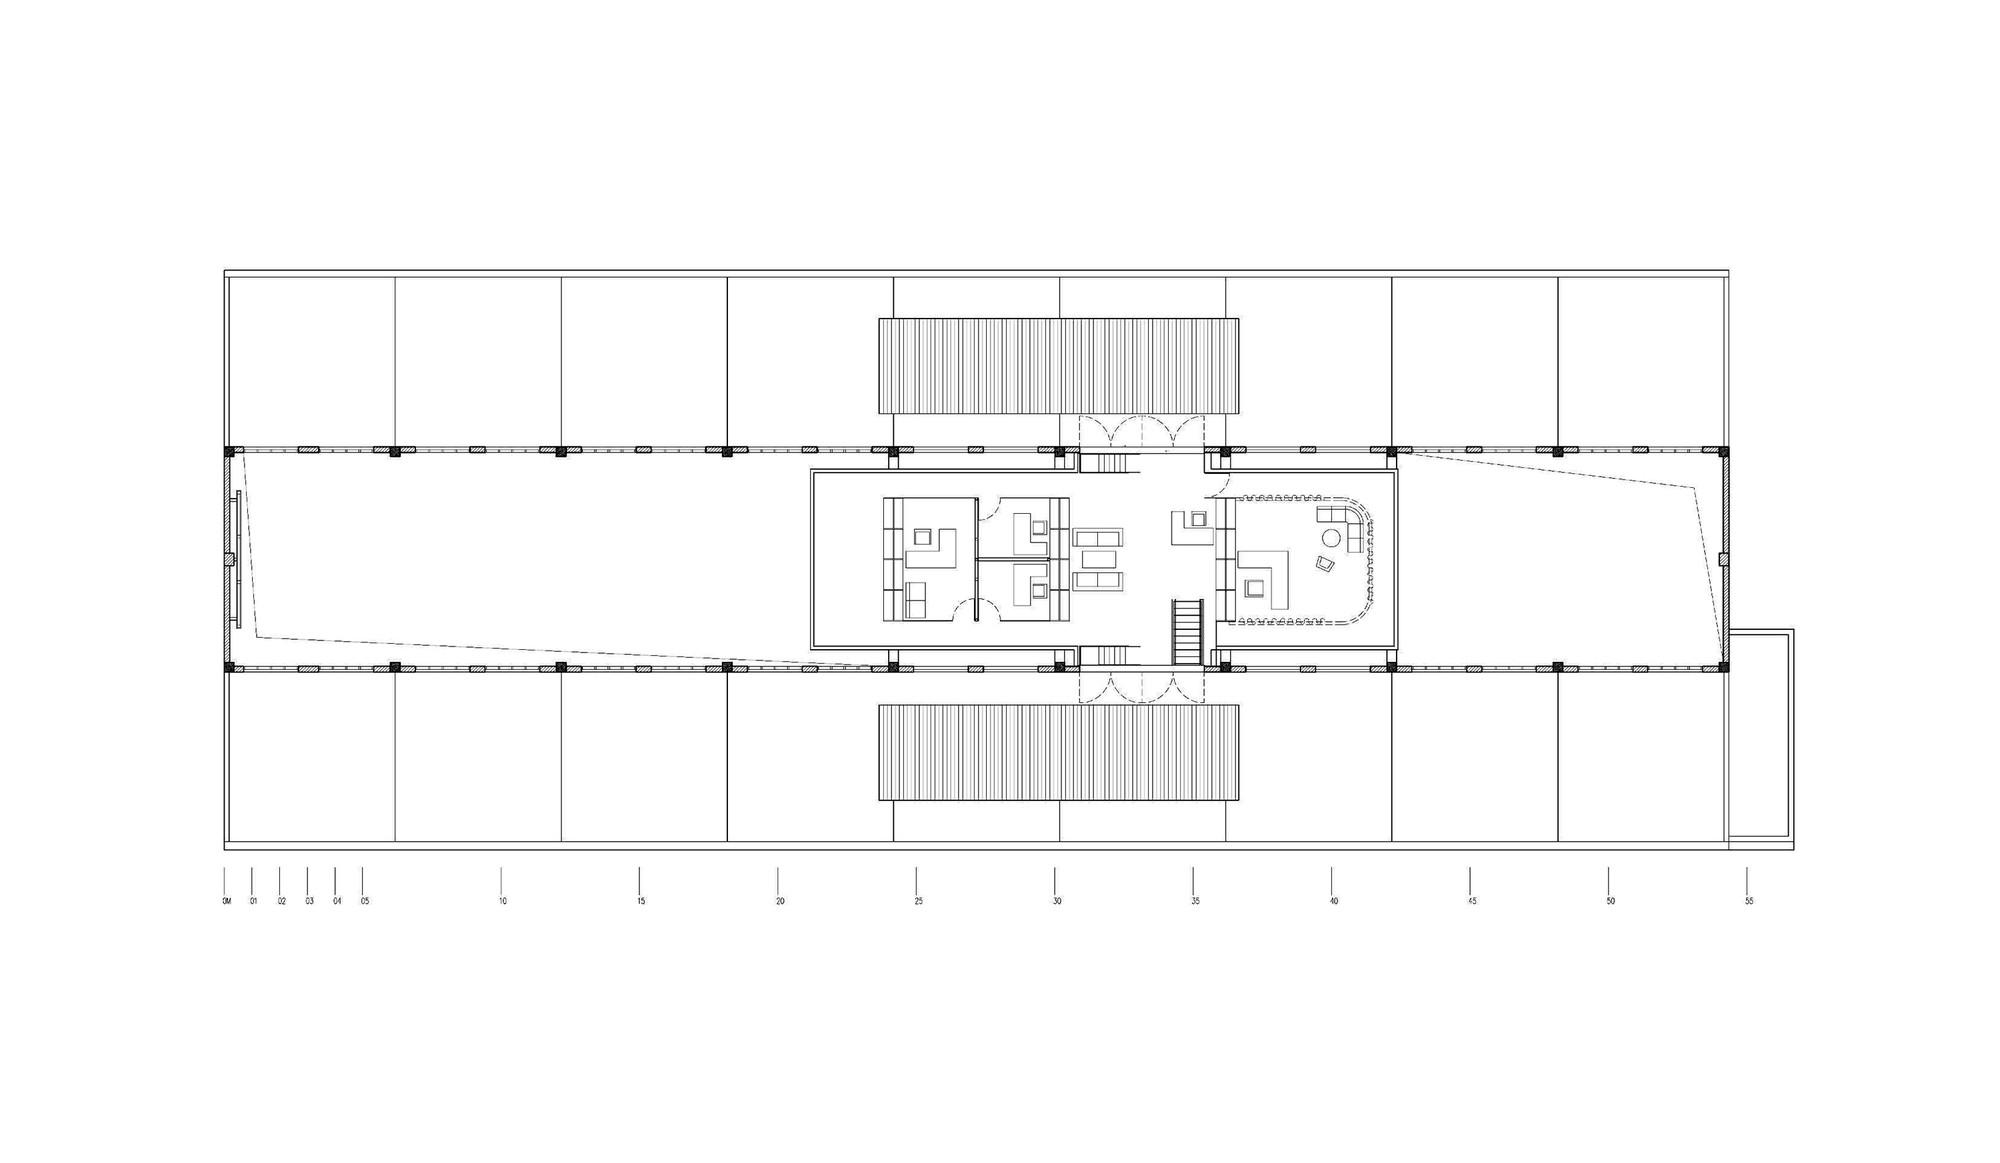 Office Sketch Plan Building  Floor